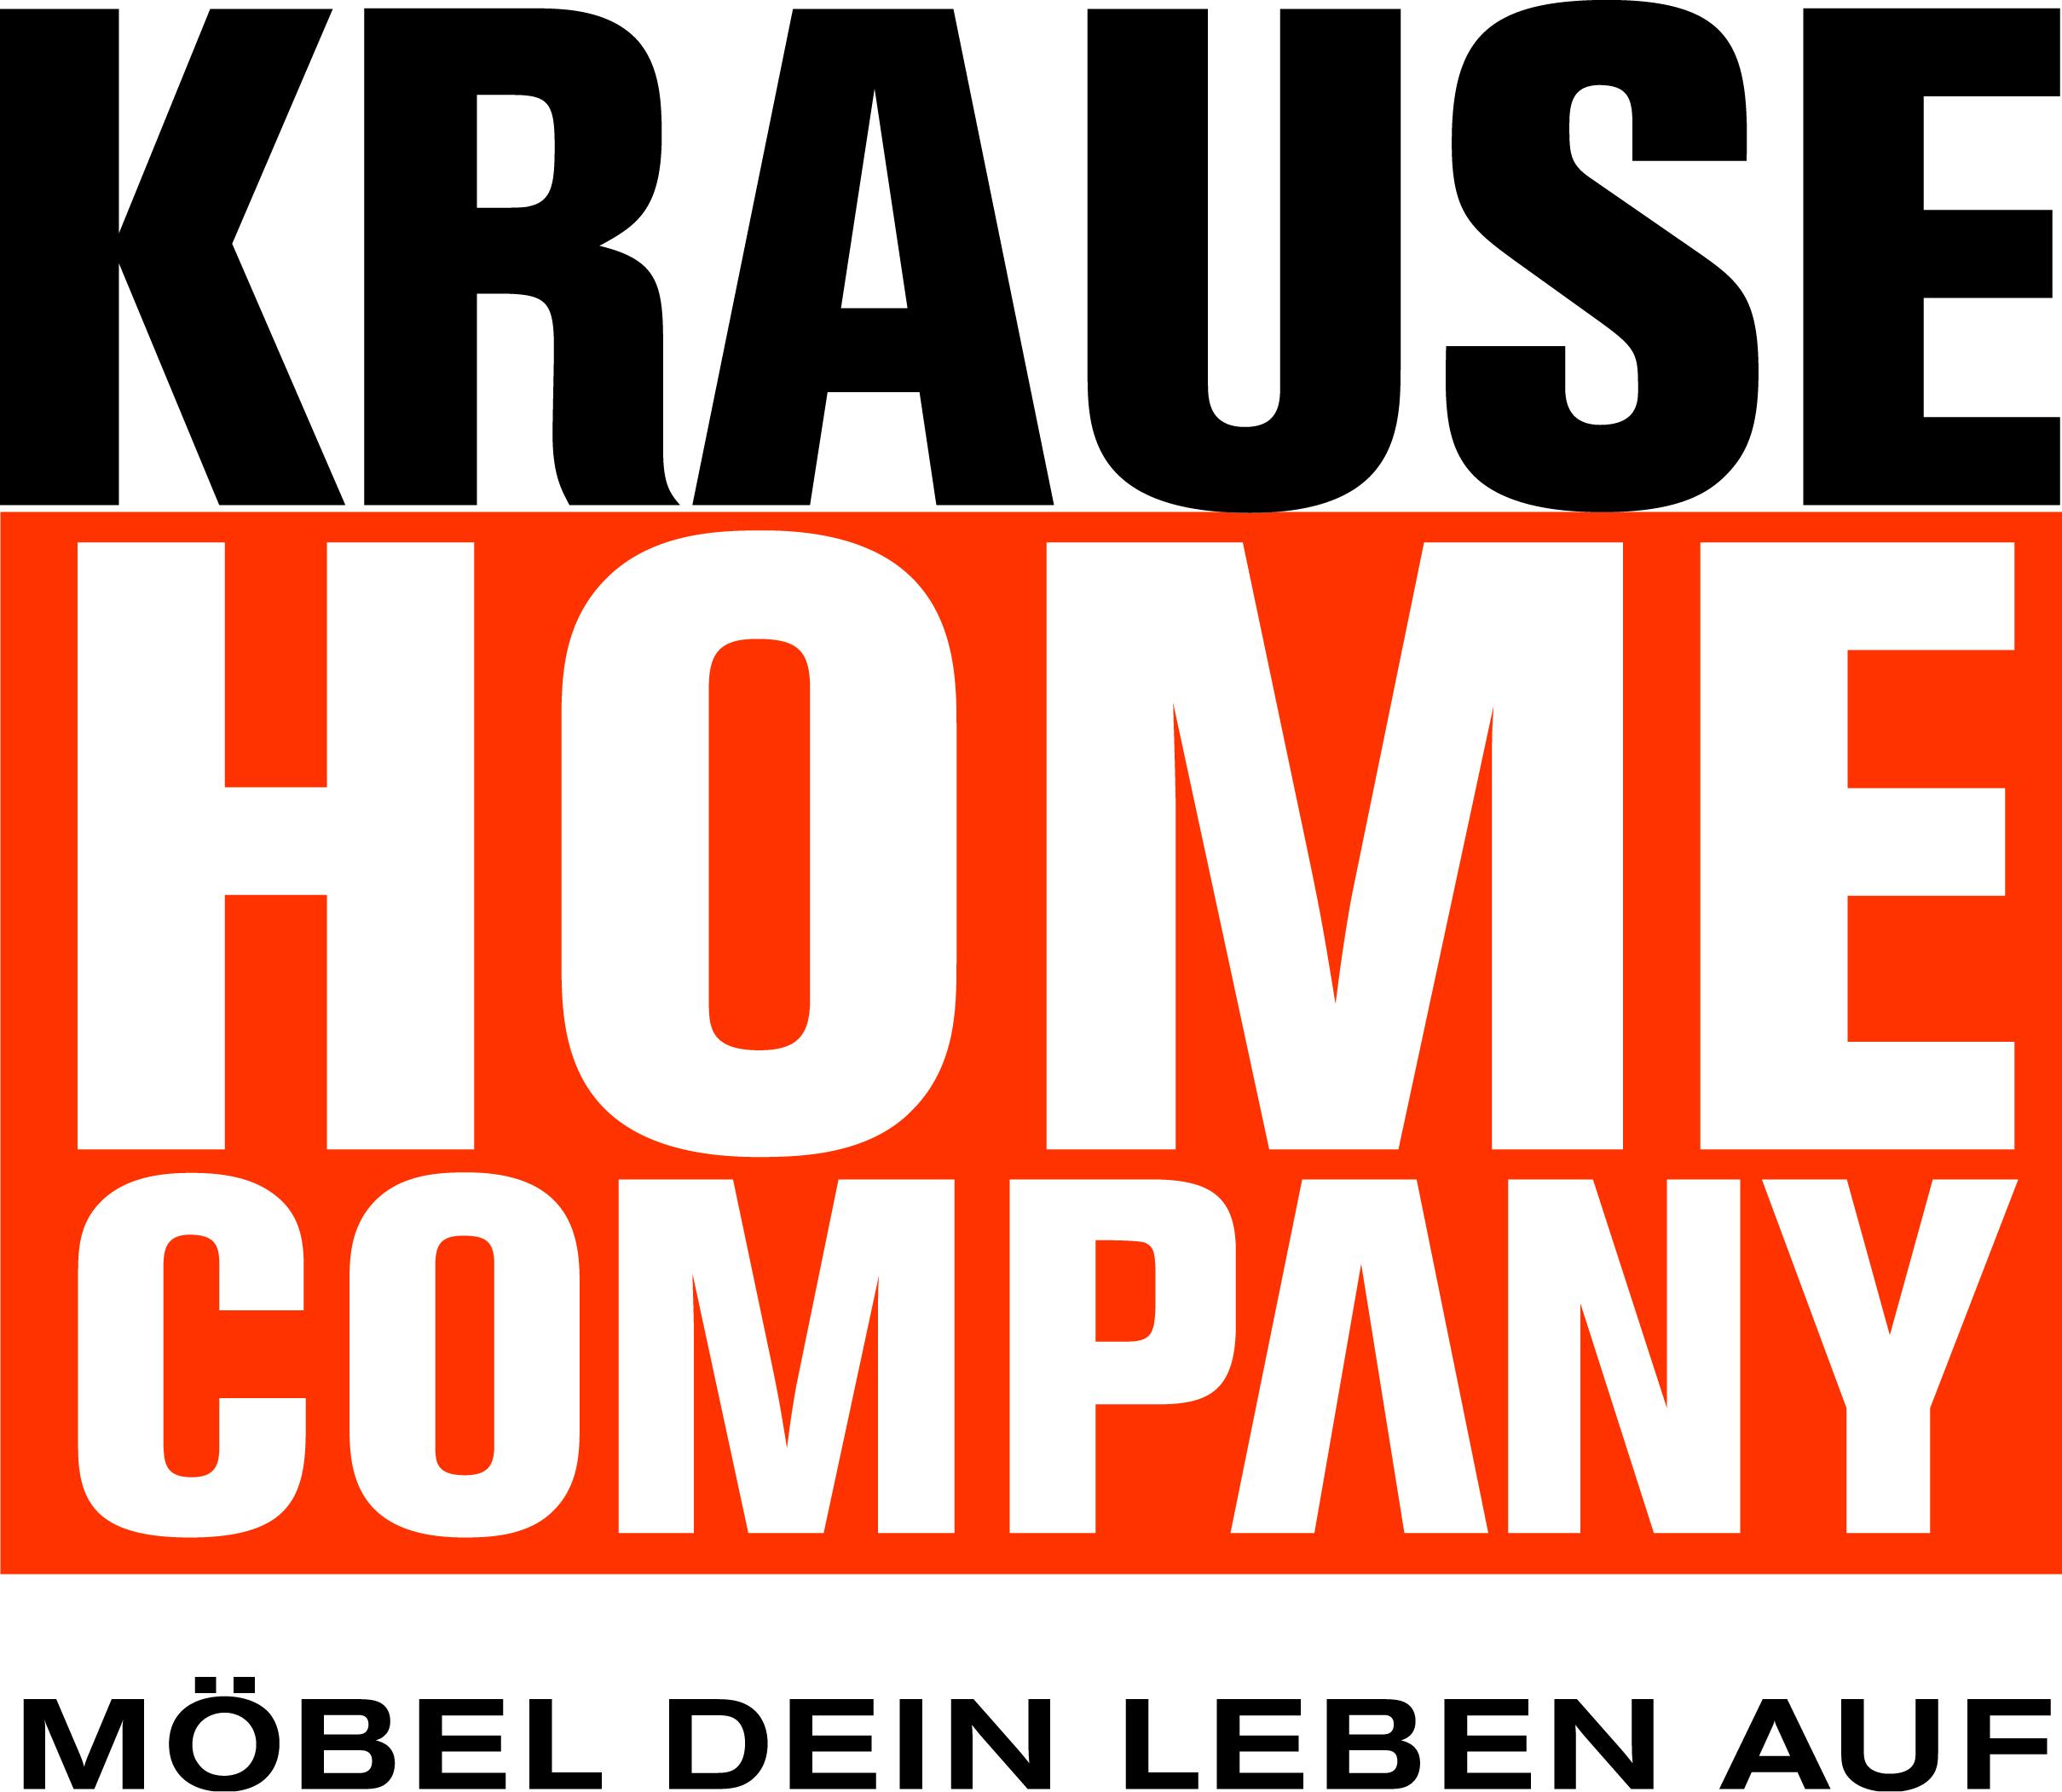 moebel-krause-gmbh--co-kg-hildesheim-himmelsthuer logo